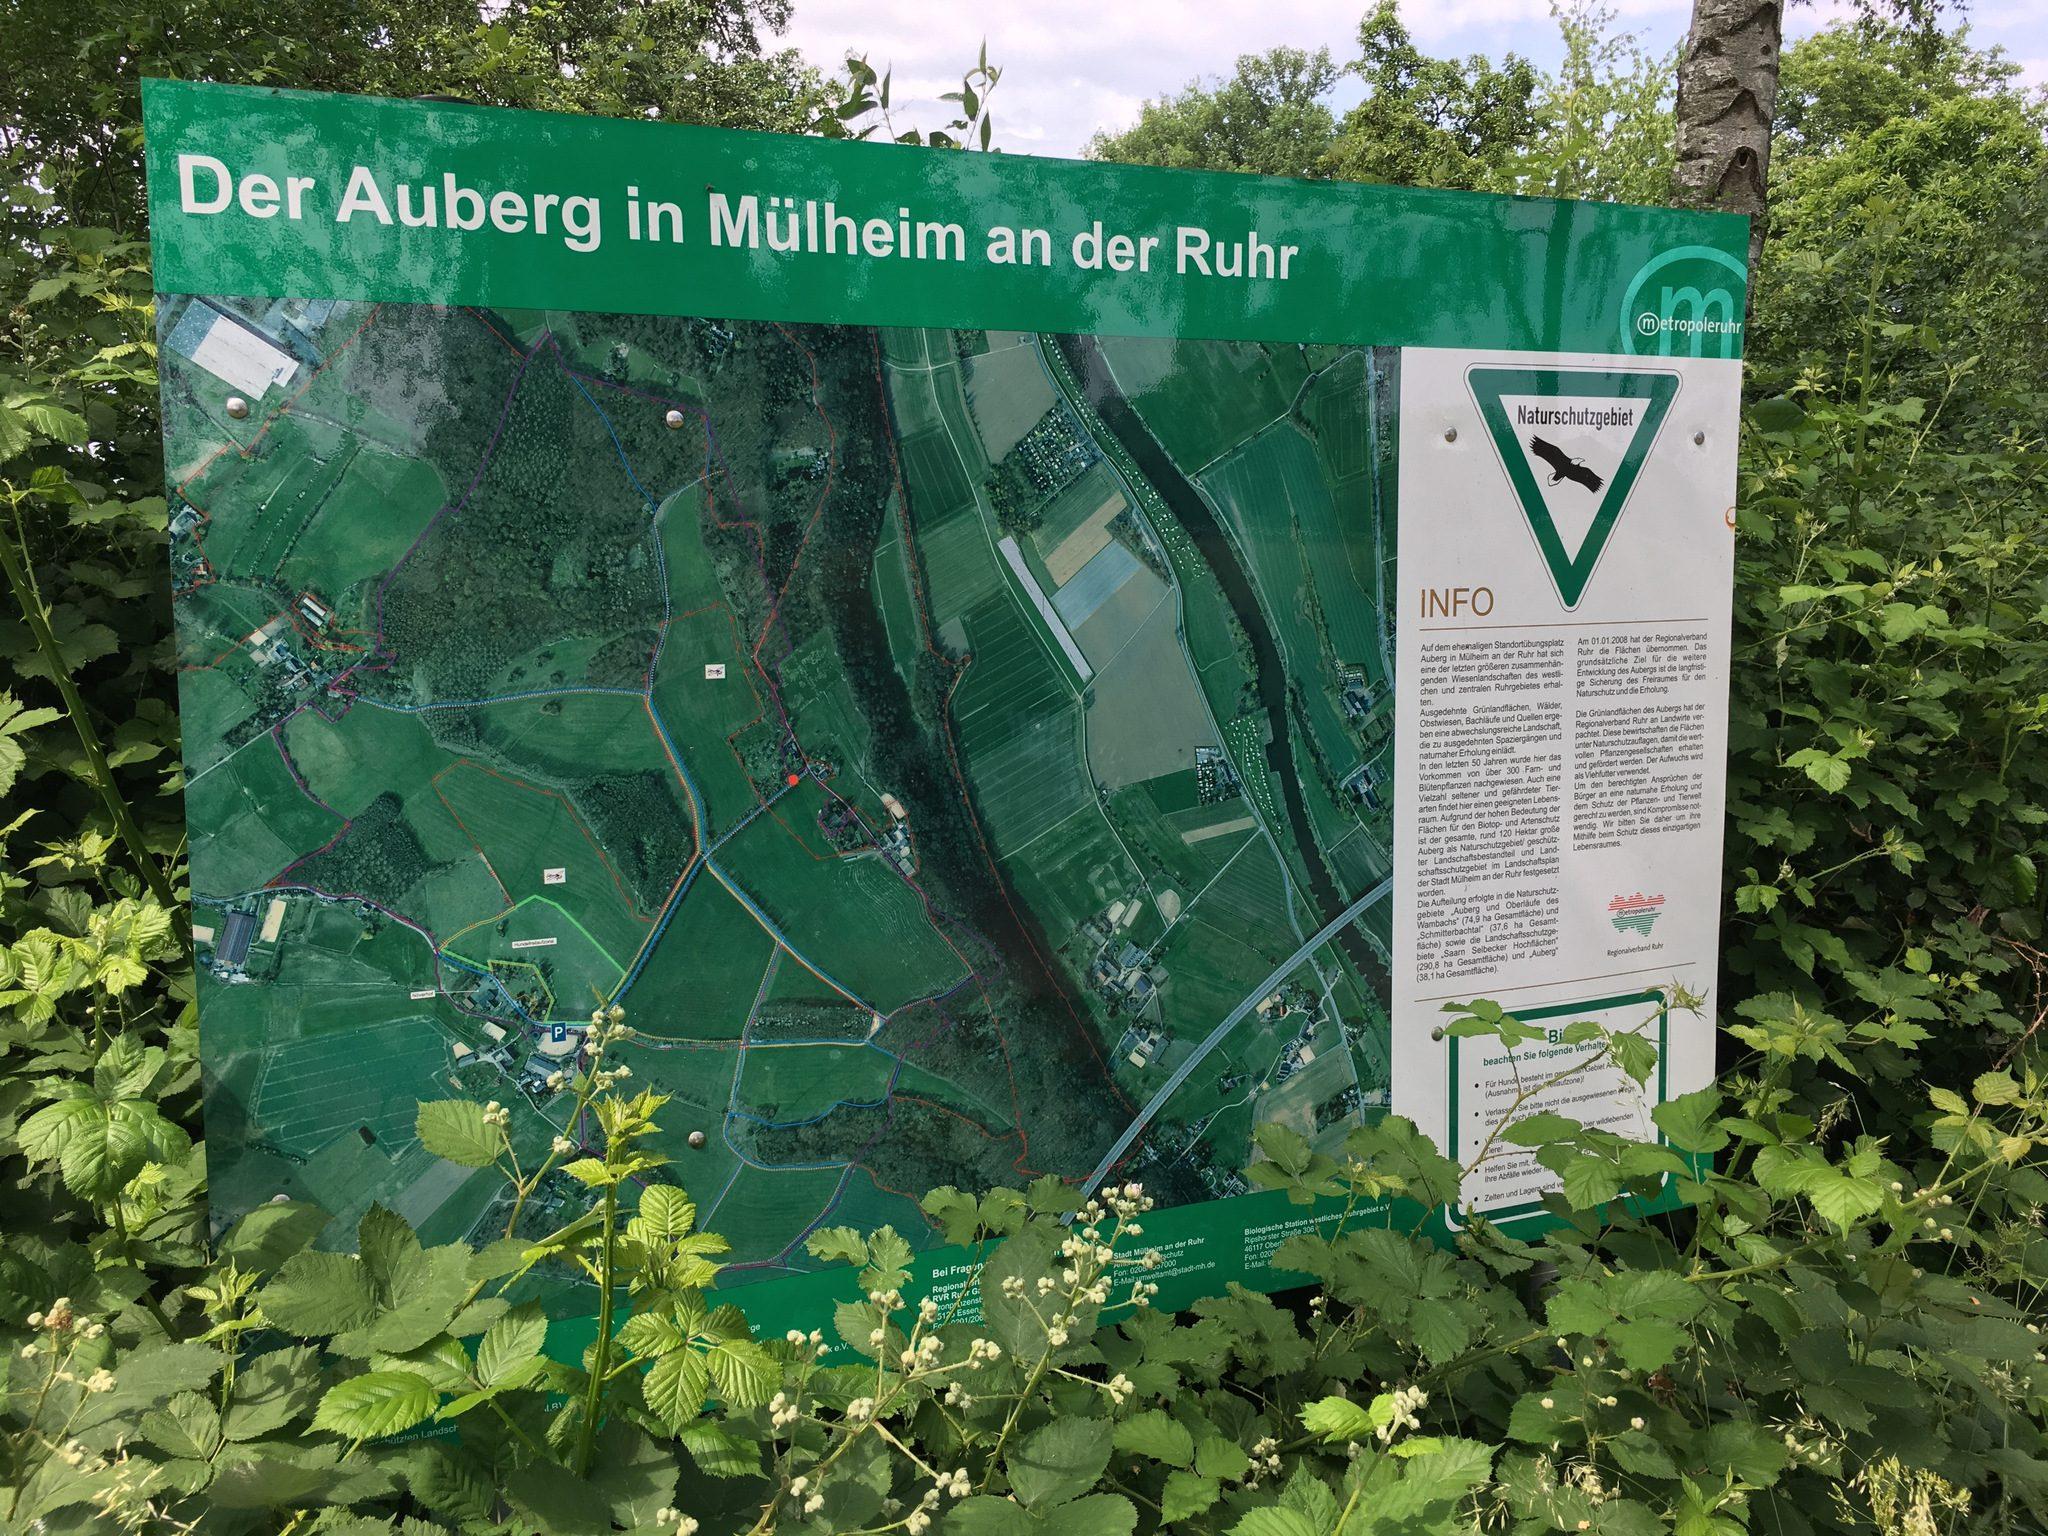 Naturschutzgebiet Auberg.